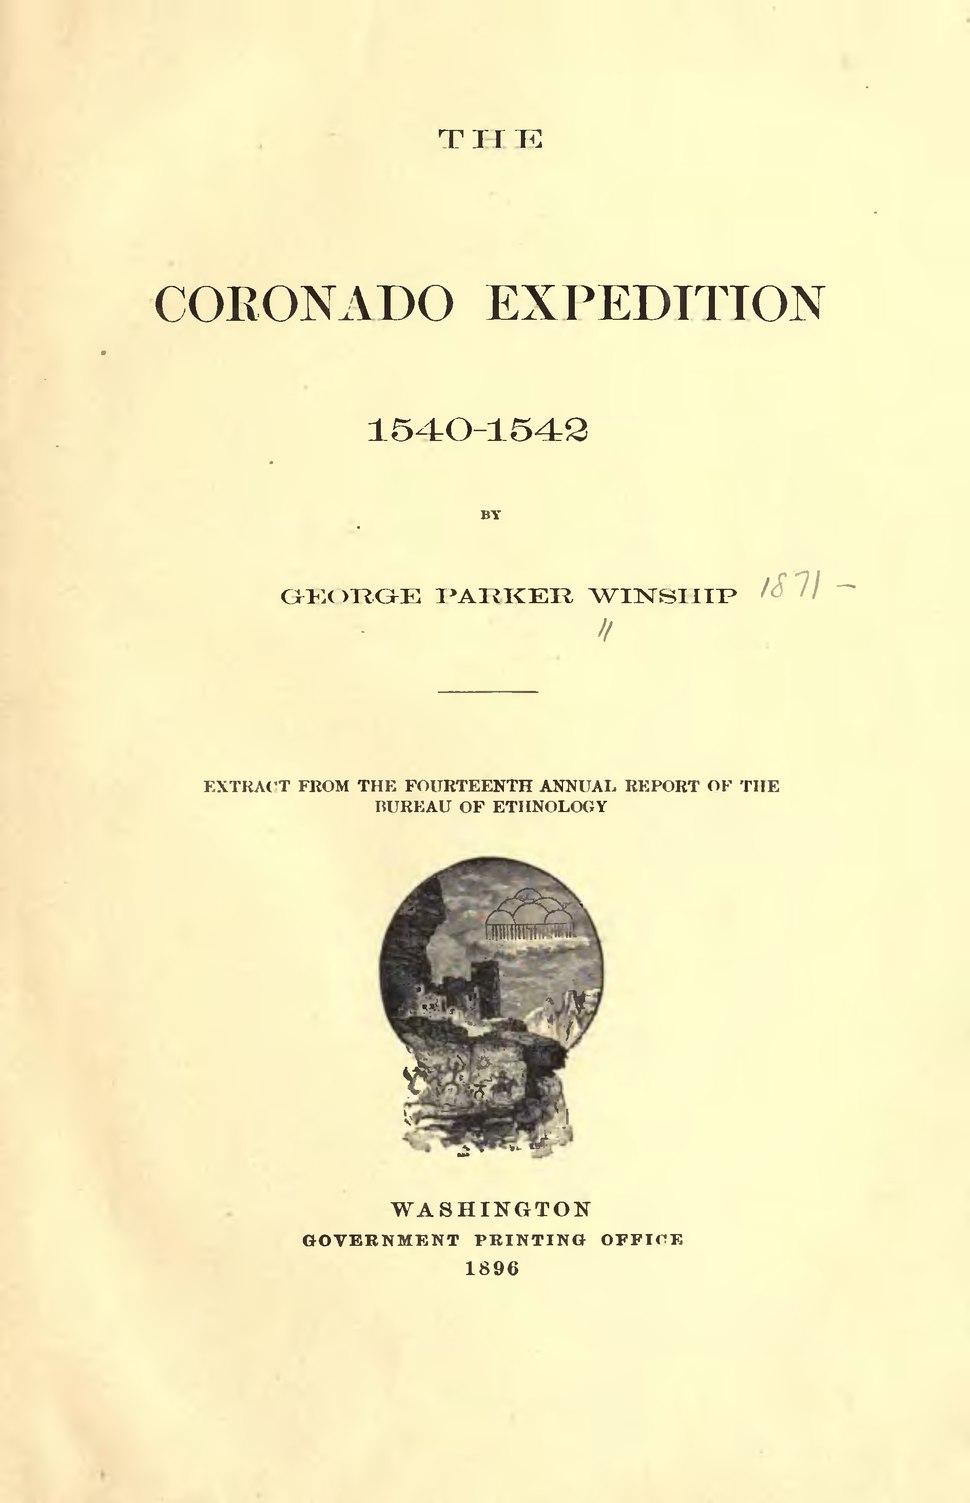 The Coronado expedition, 1540-1542.djvu&page=7